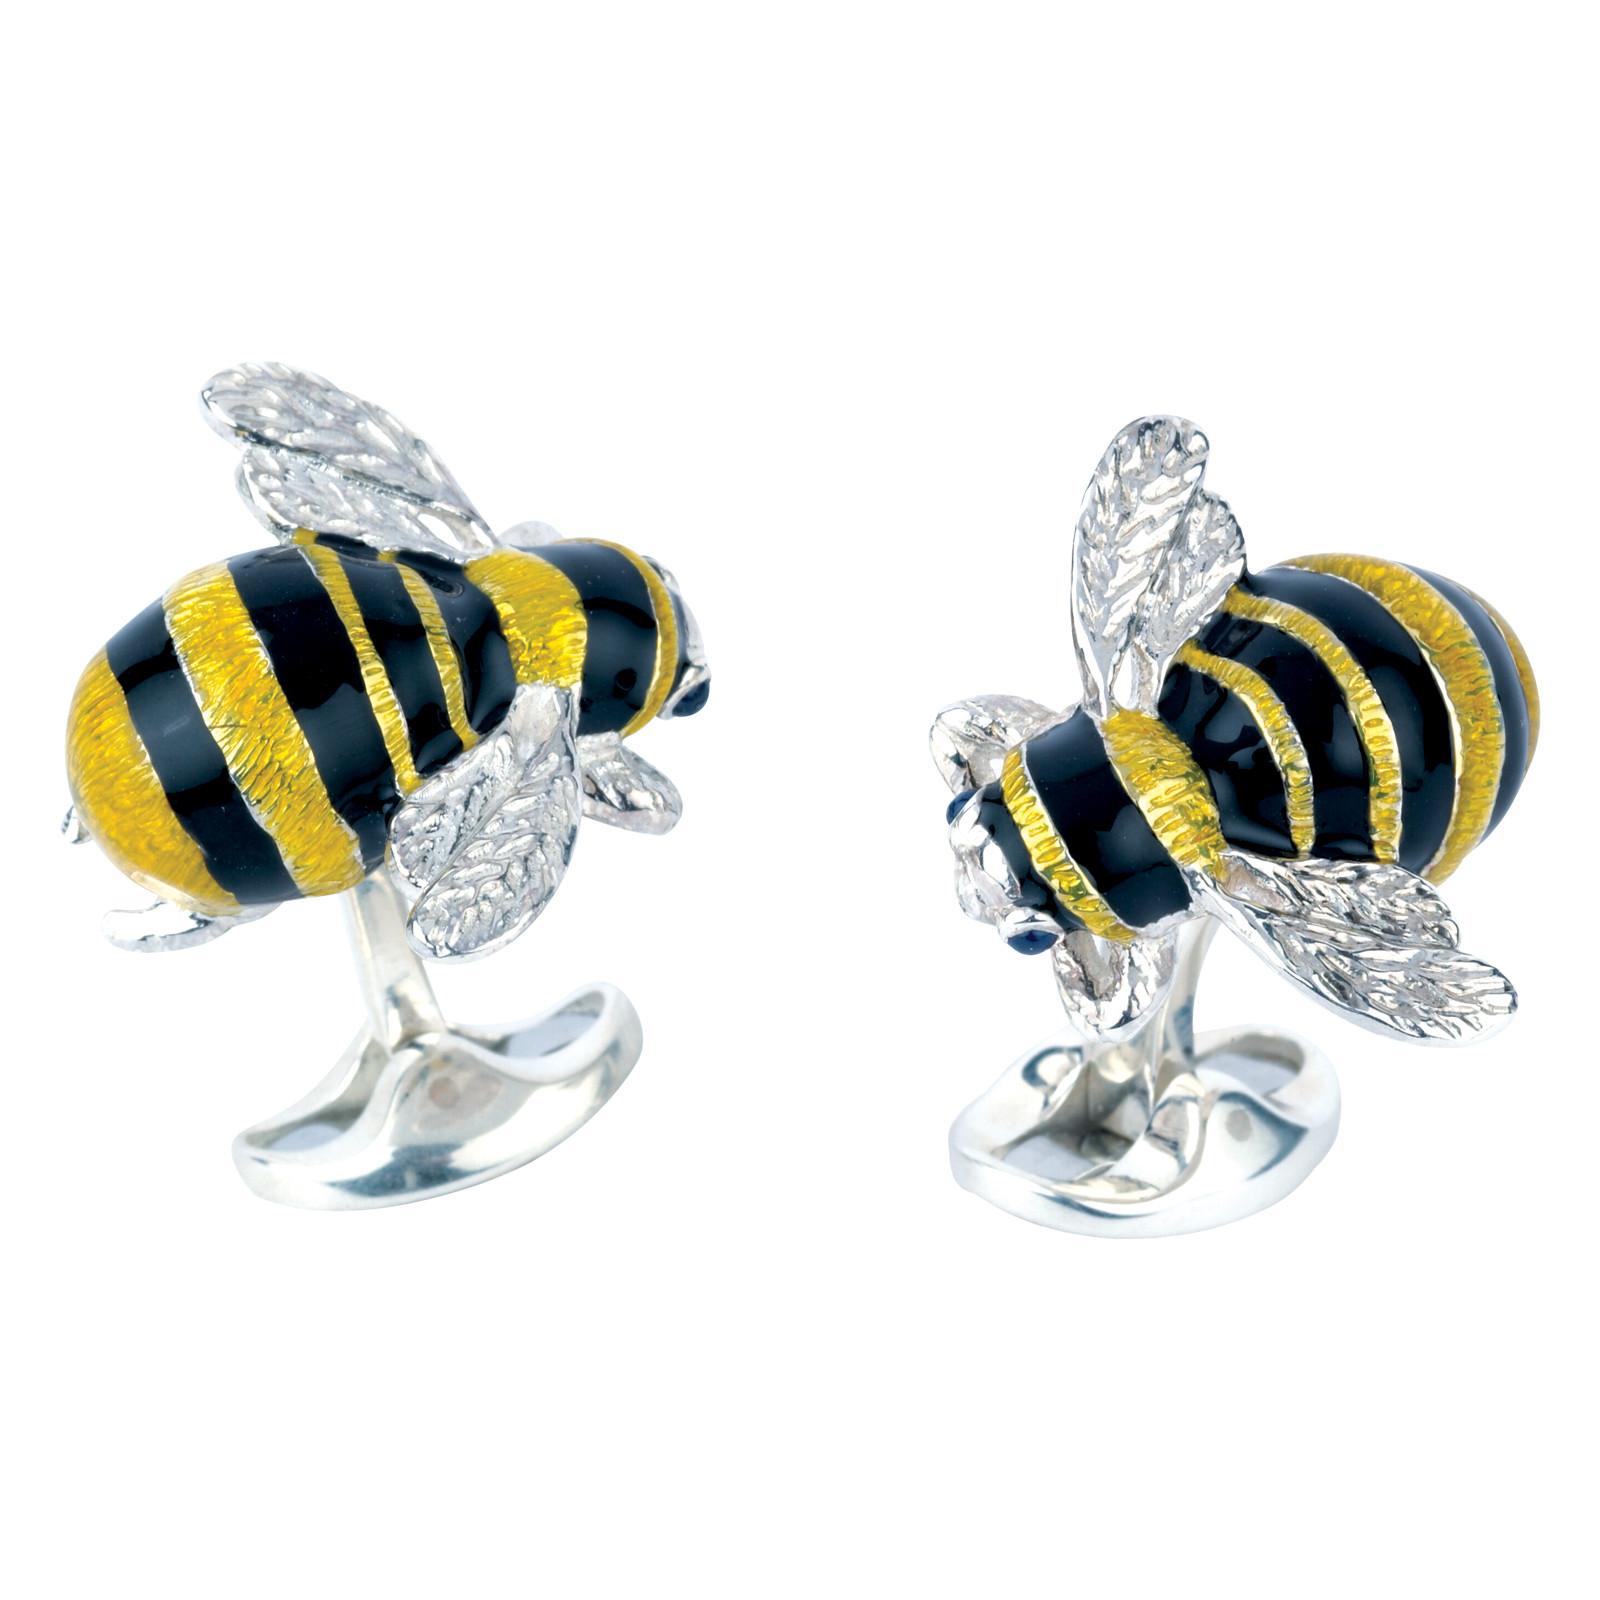 New Deakin & Francis Bumble Bee Cufflinks